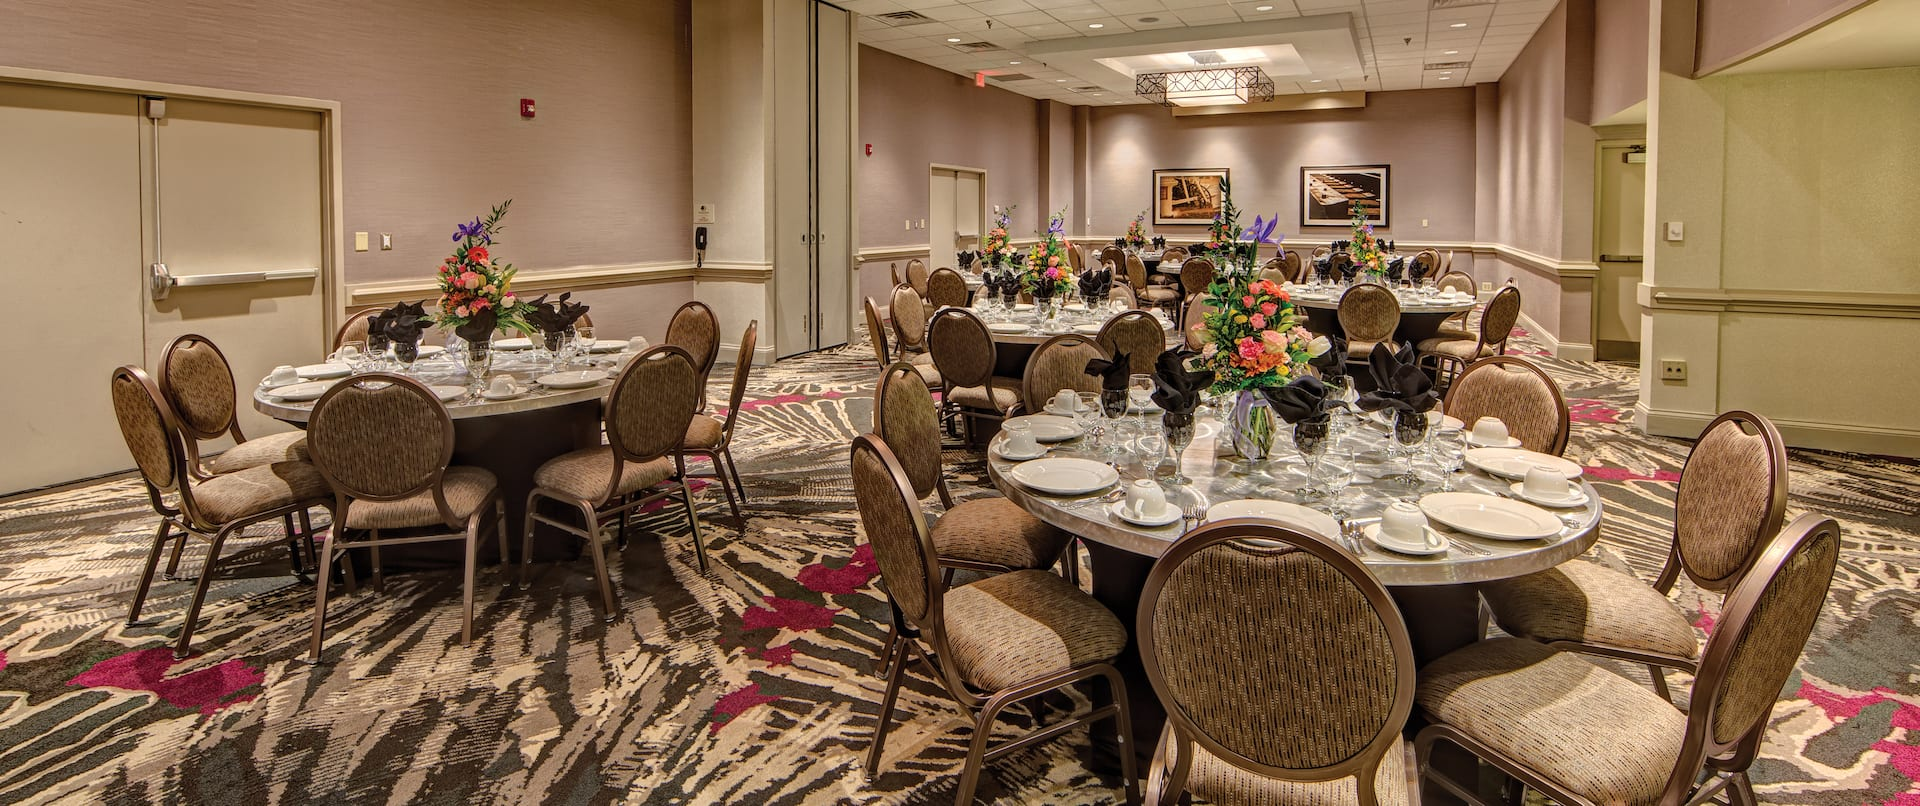 Ballroom With Event Set Up